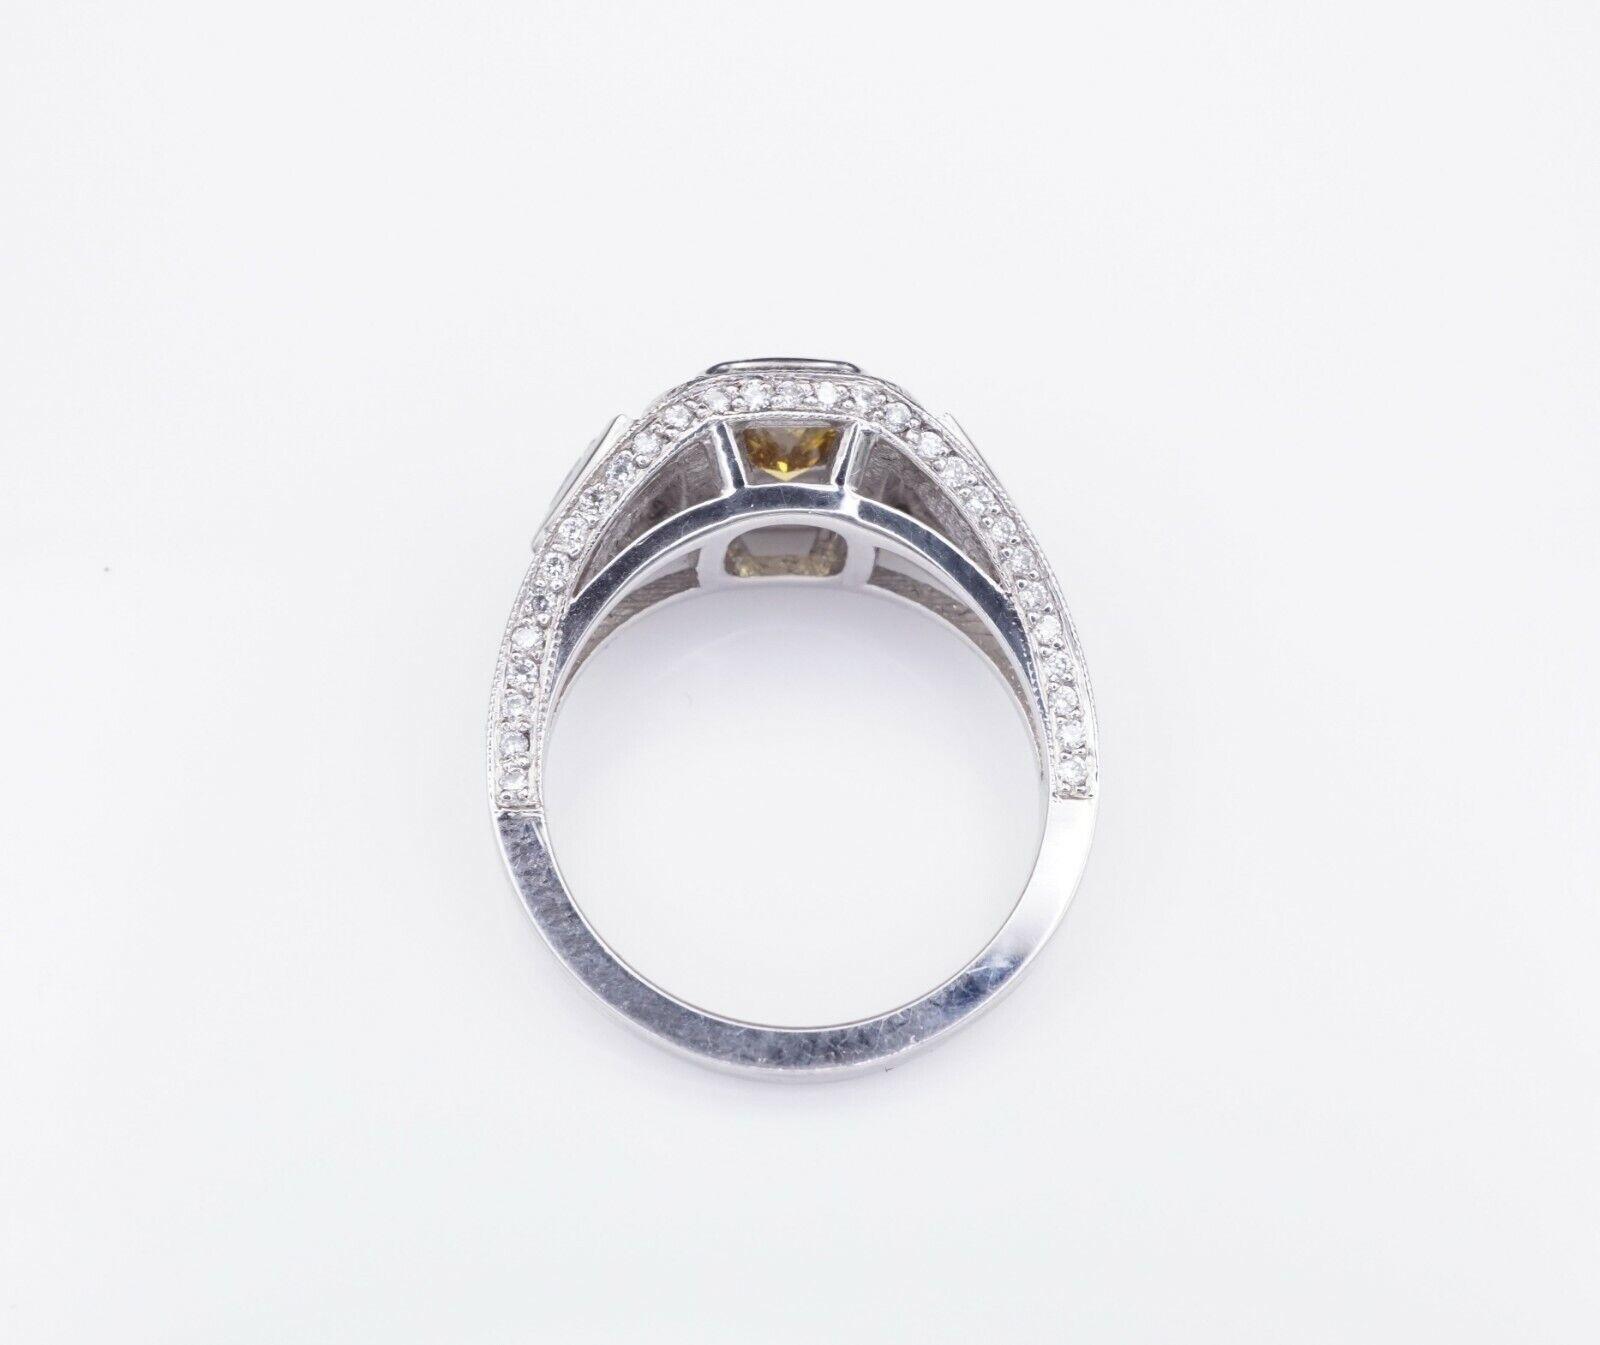 Platinum 3ct Orange-Yellow Diamond Halo Engagement Ring Size 6.75 GIA CO450 5